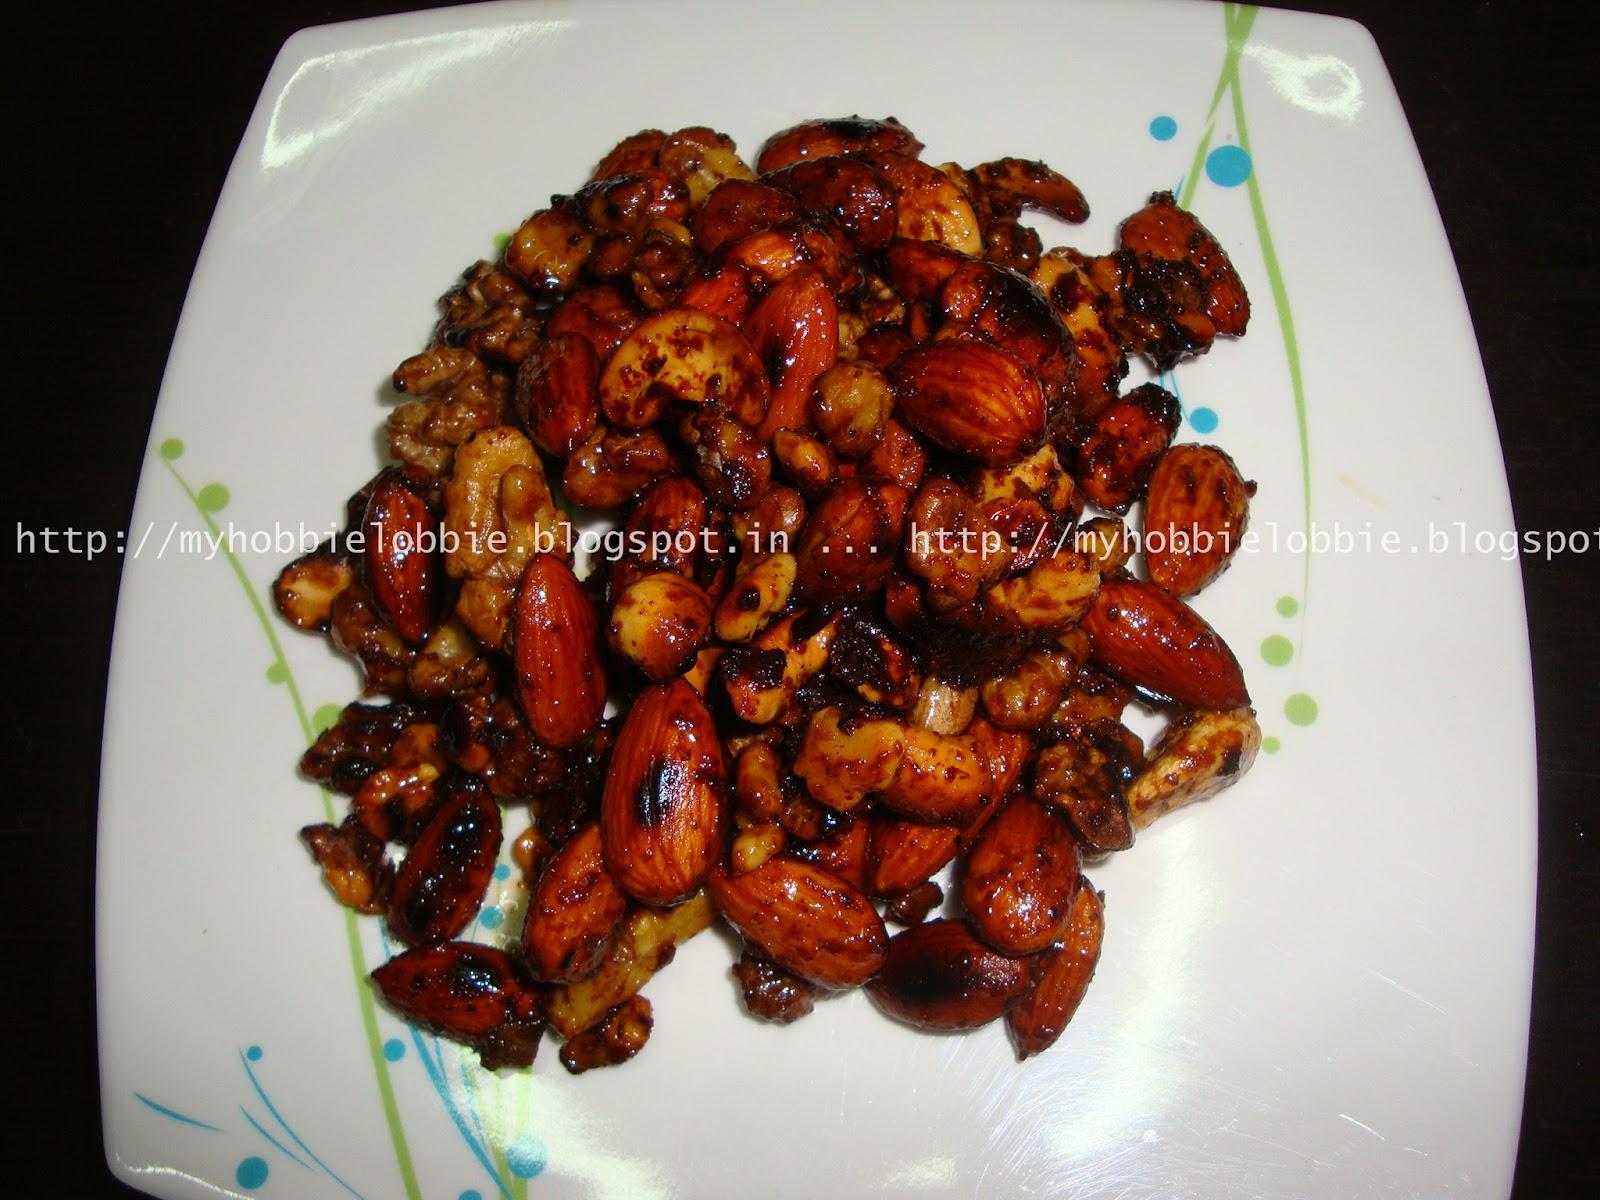 Spiced Candied Walnuts Recipe — Dishmaps